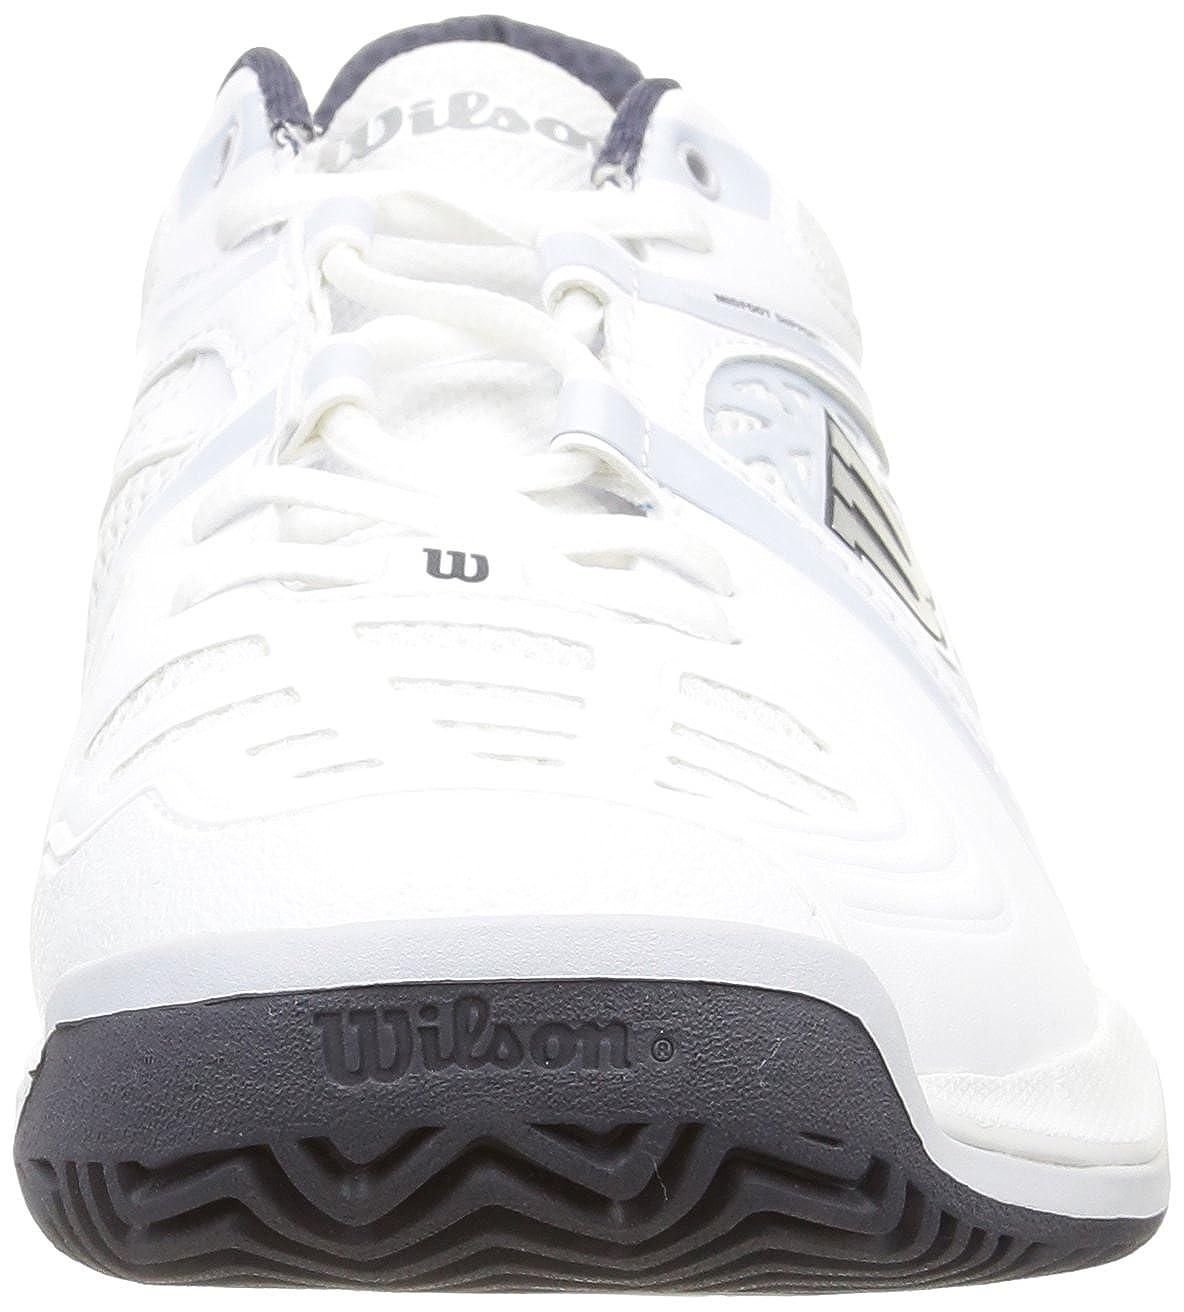 Casinò e attrezzature Scarpe da Tennis Uomo Nike Tennis